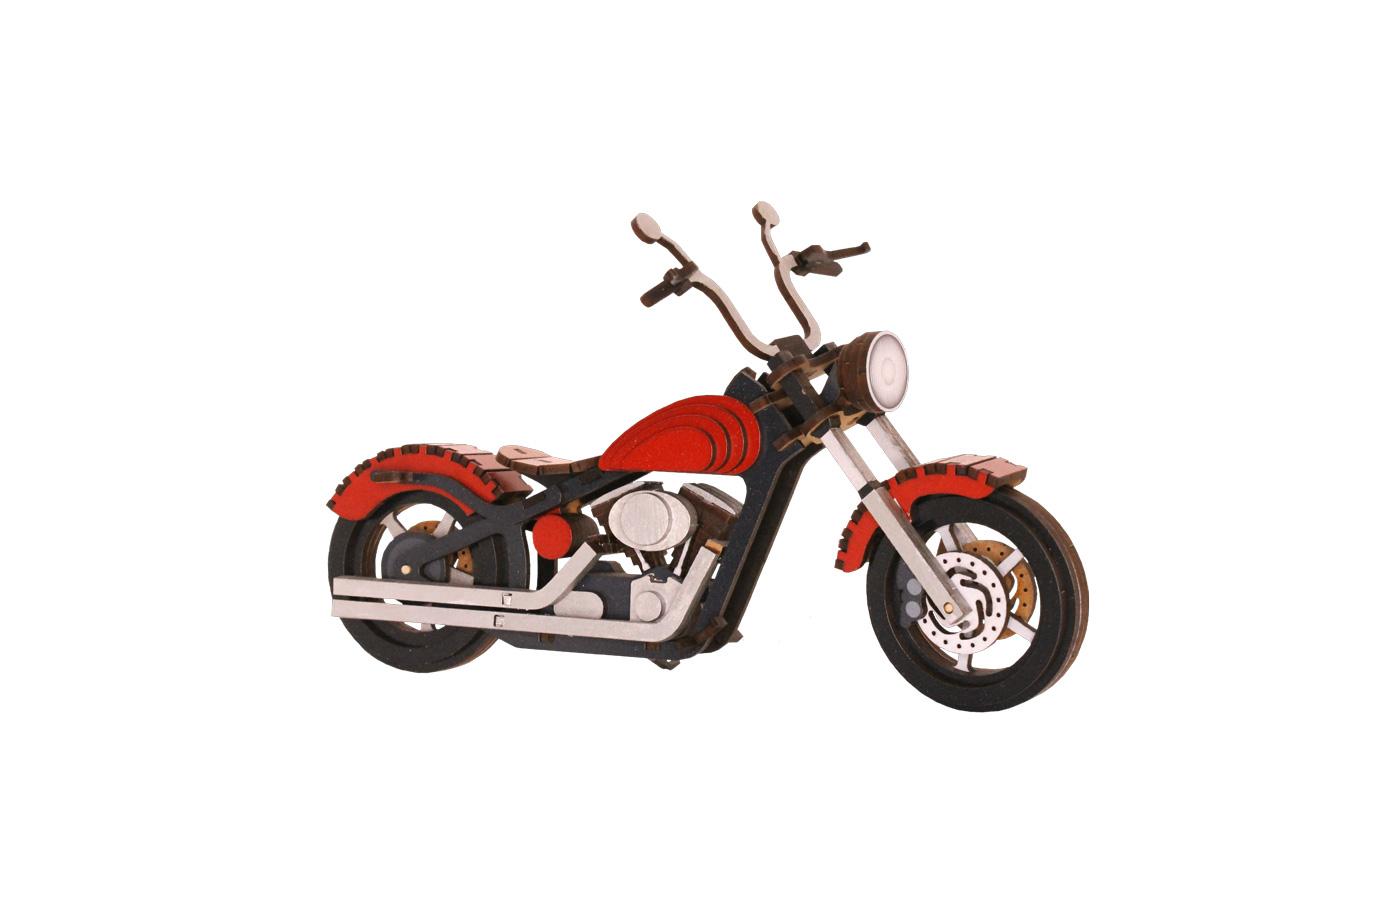 Motocyclette en bois 5